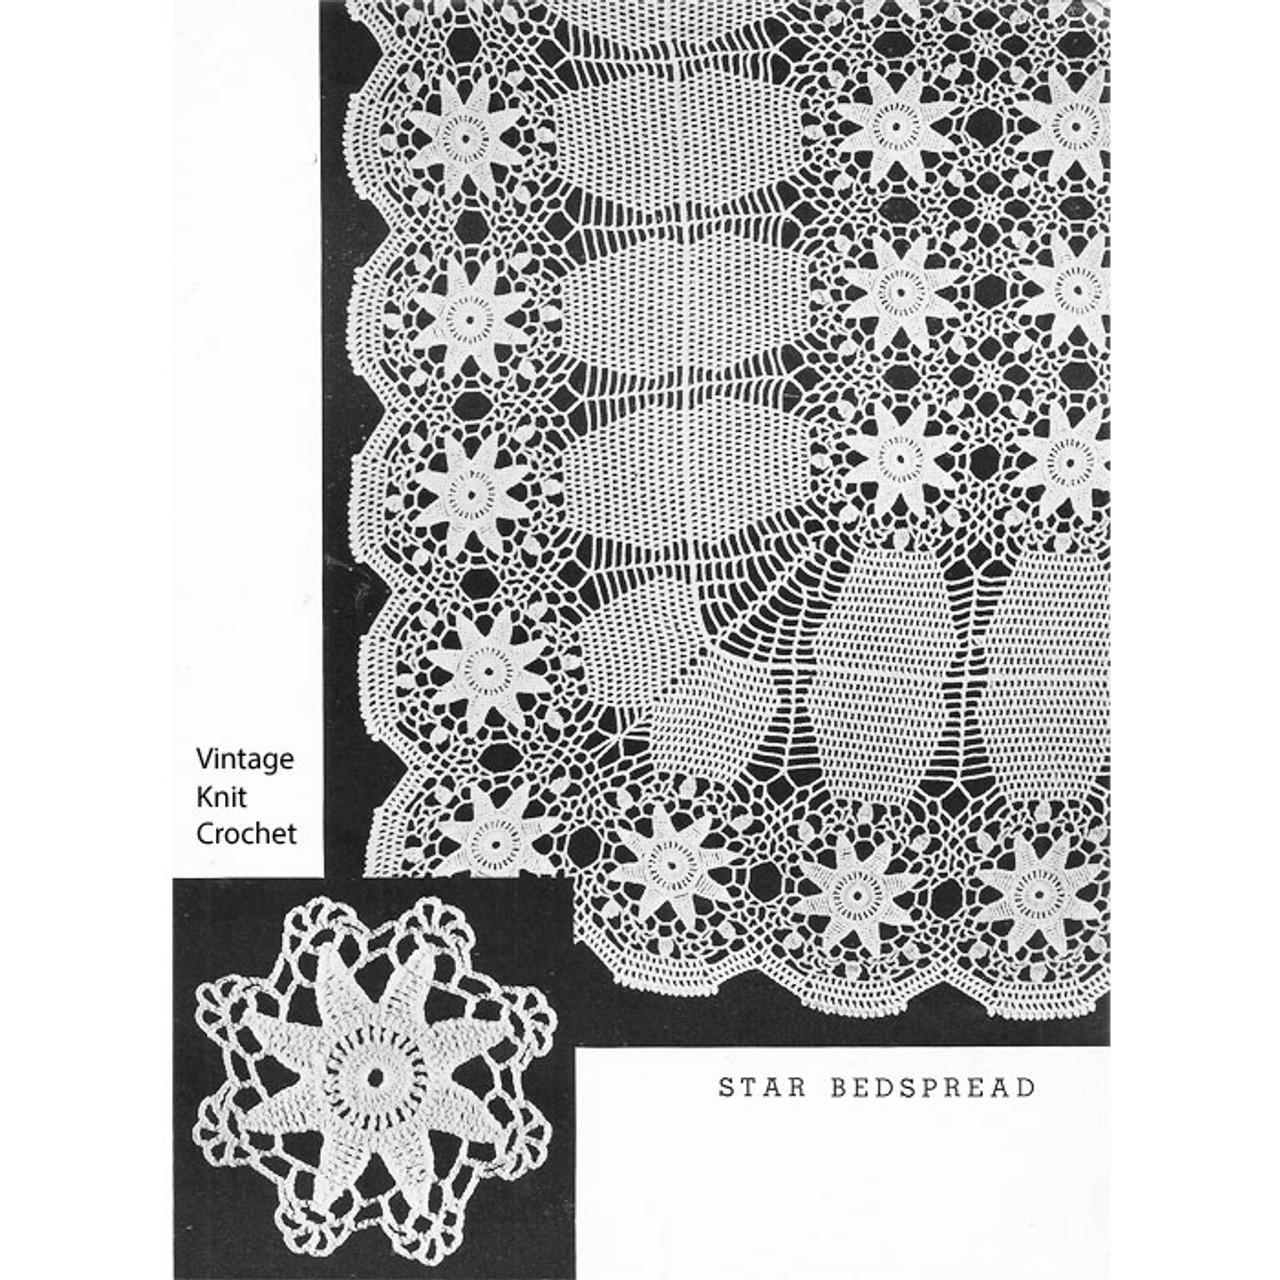 Crochet Star Medallion Bedspread Pattern